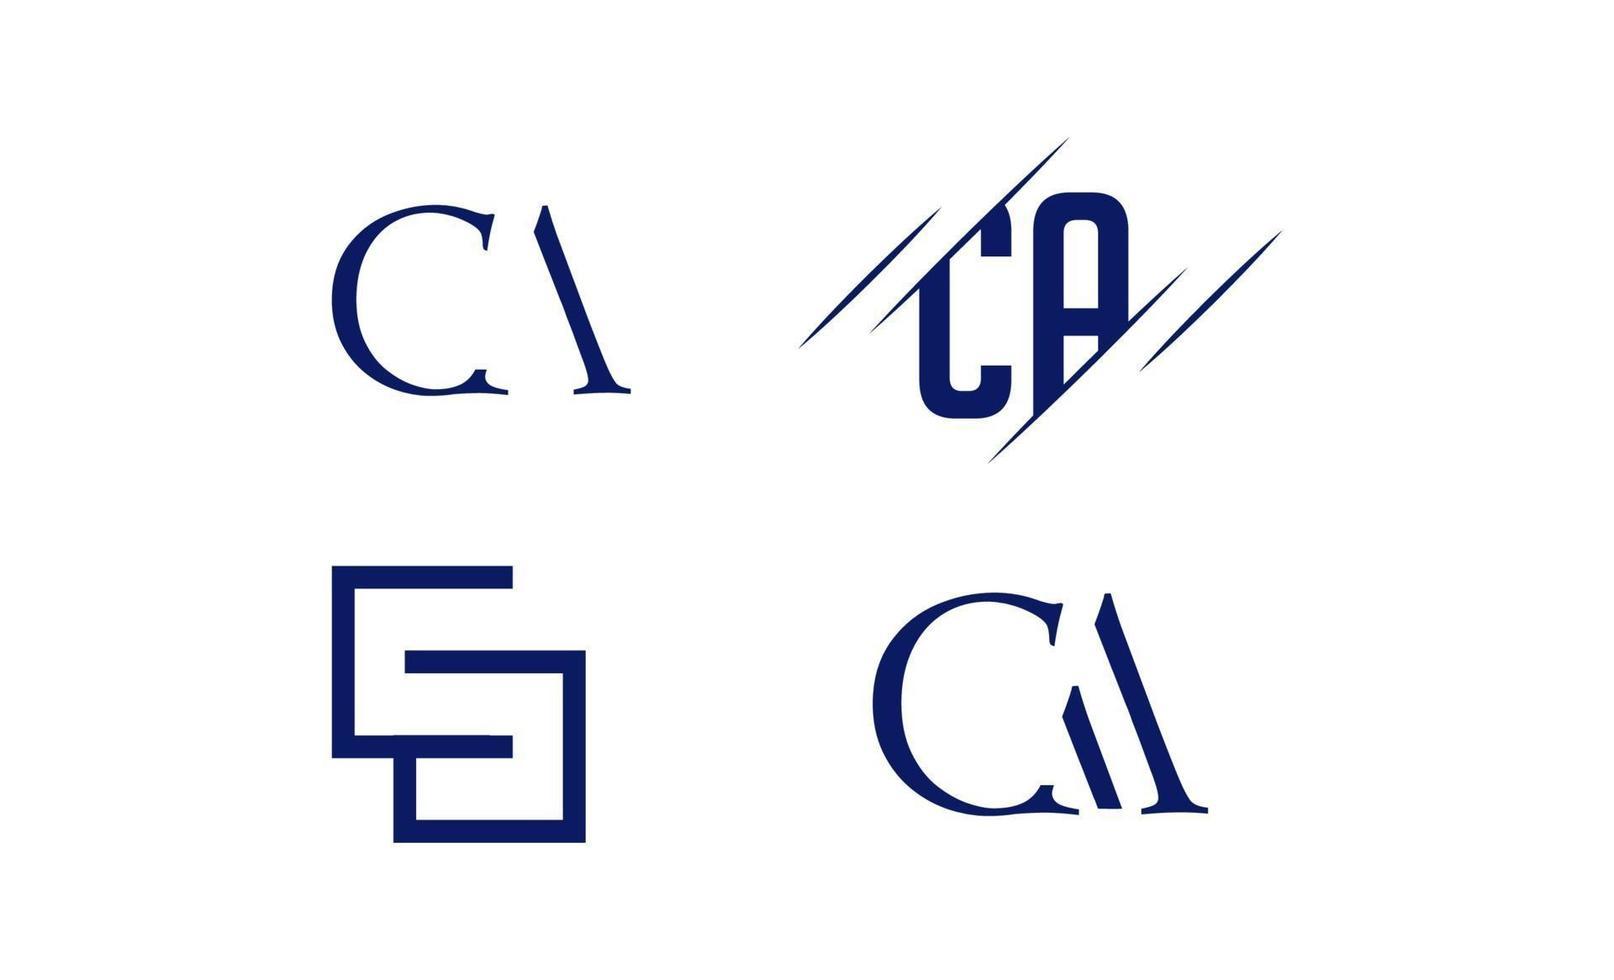 anfängliche Wechselstrom-, Ca-, A-, C-Logo-Schablonenvektorillustration vektor